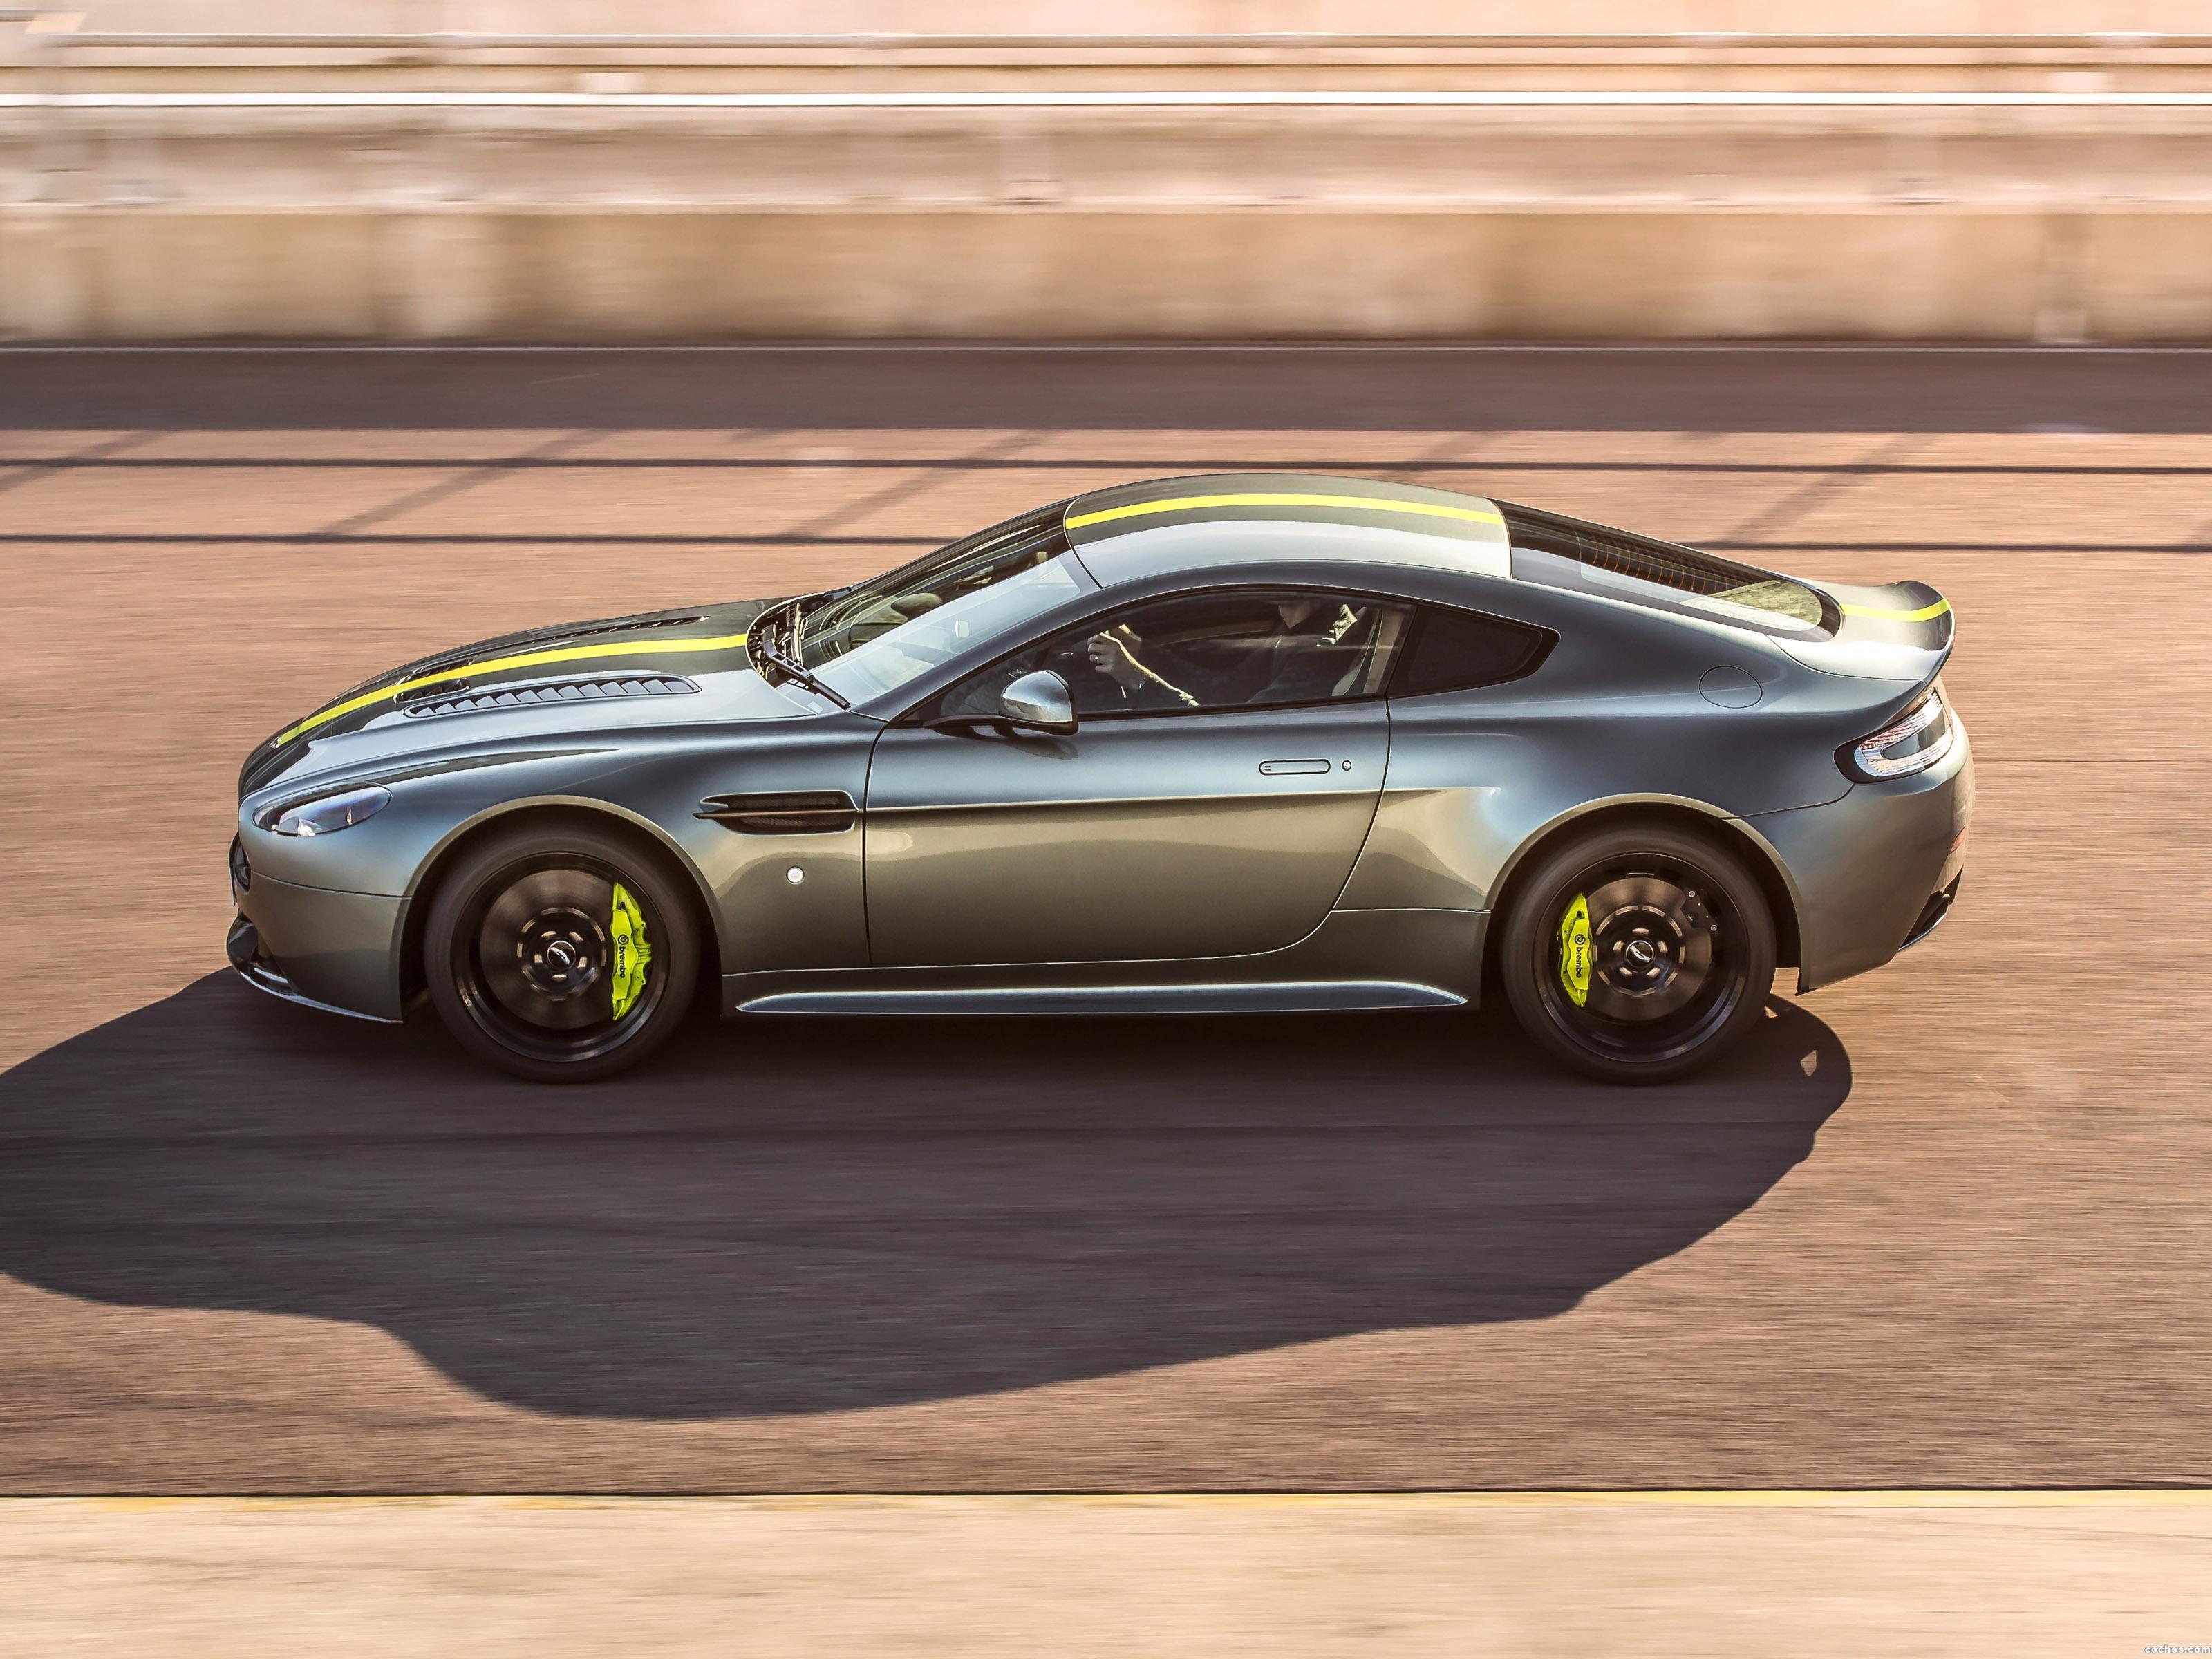 Foto 3 de Aston Martin V12 Vantage AMR UK 2017